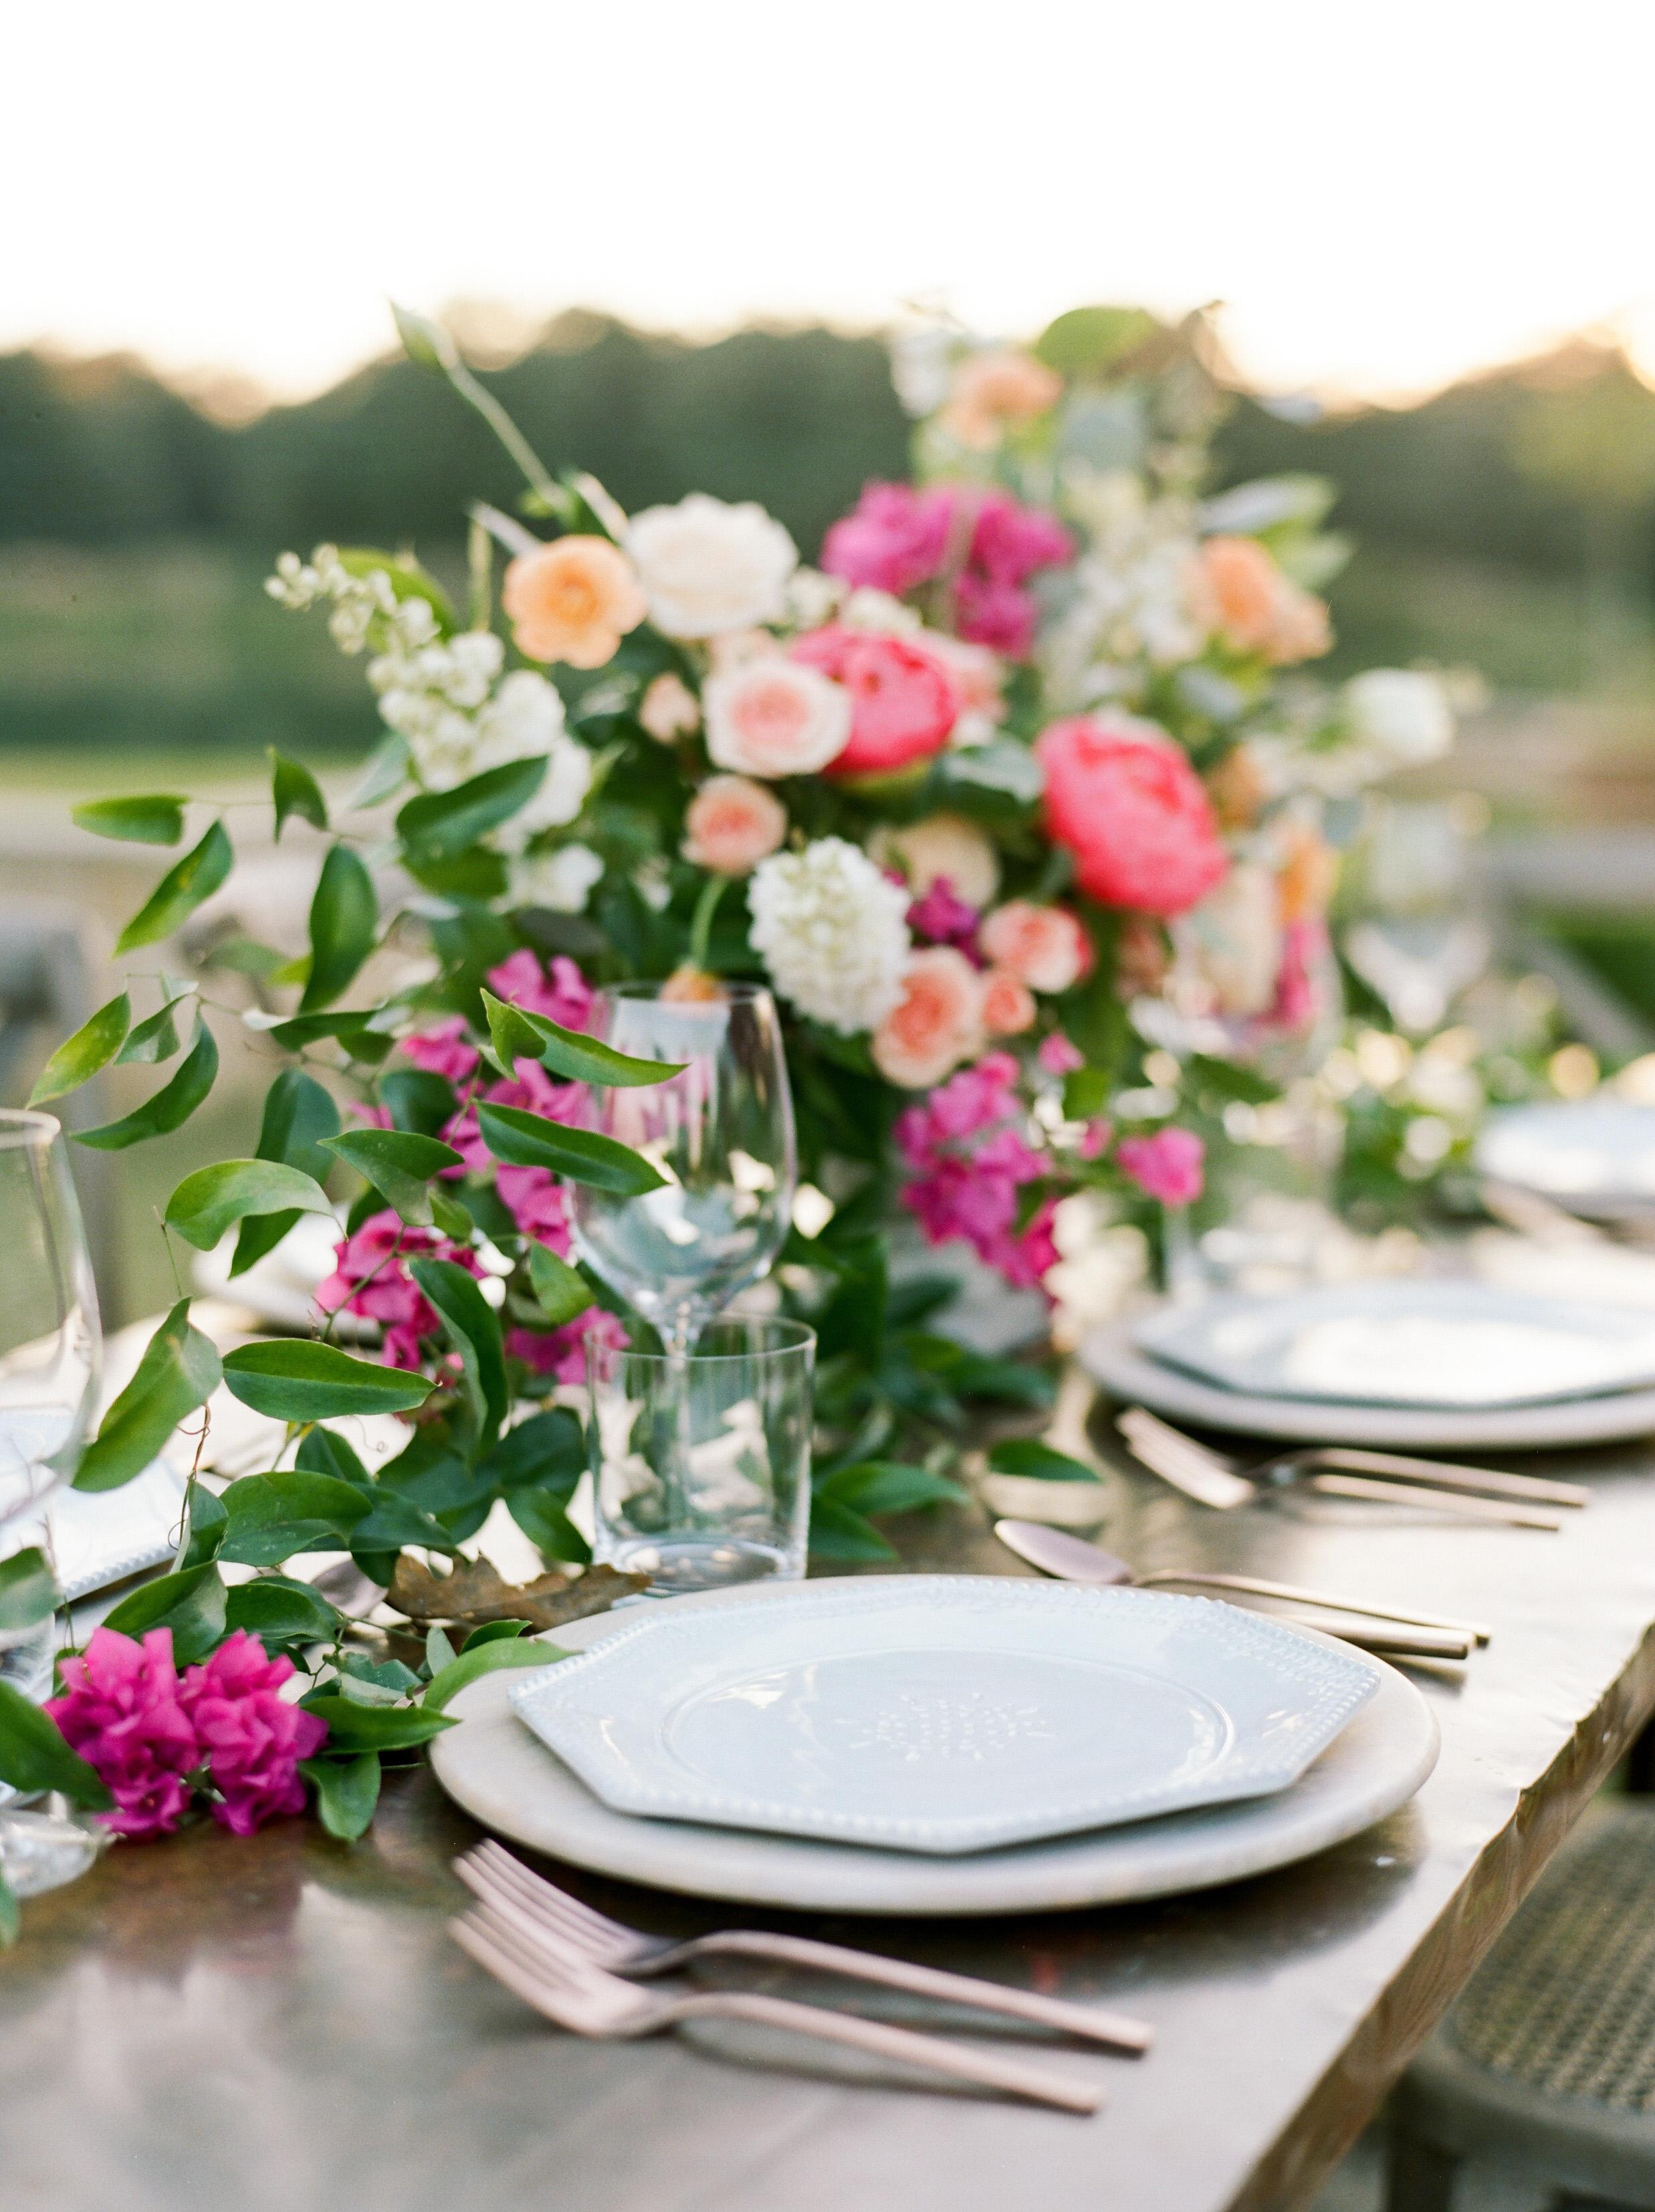 Top-Houston-Wedding-Photographer-Dana-Fernandez-Photography-The-Clubs-At-Houston-Oaks-Country-Club-Belle-Events-Film-Fine-Art-Destination-23.jpg